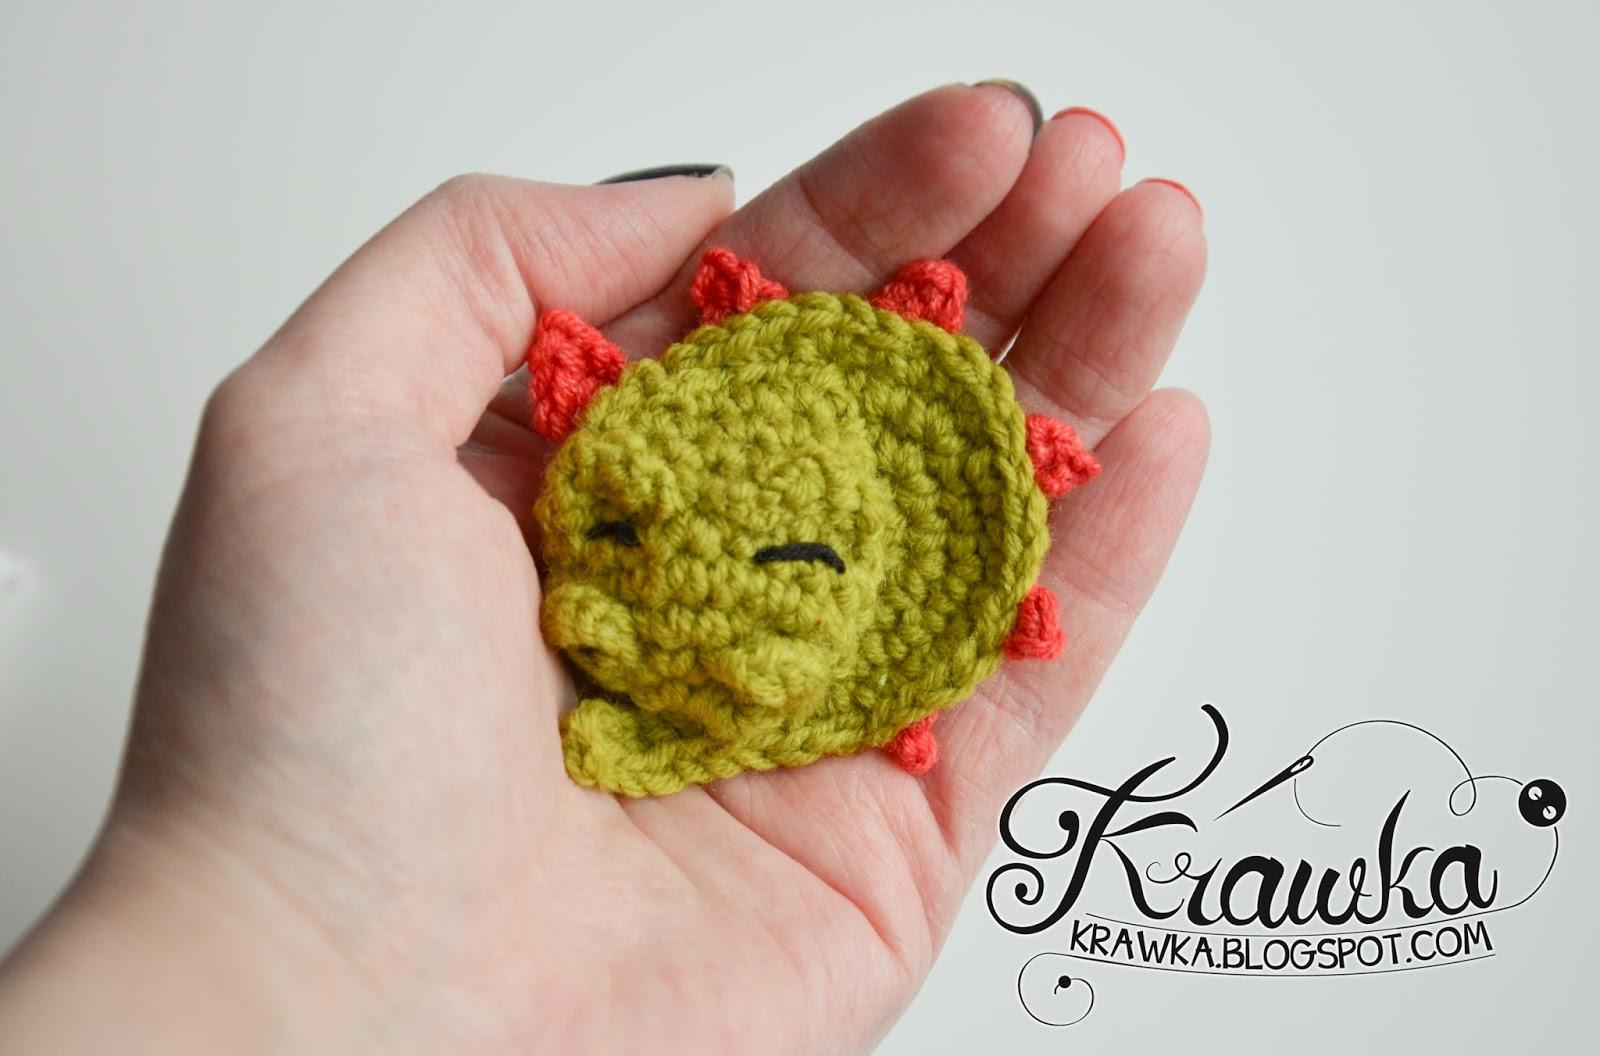 Krawka: Sleeping dragon brooch crochet with free pattern